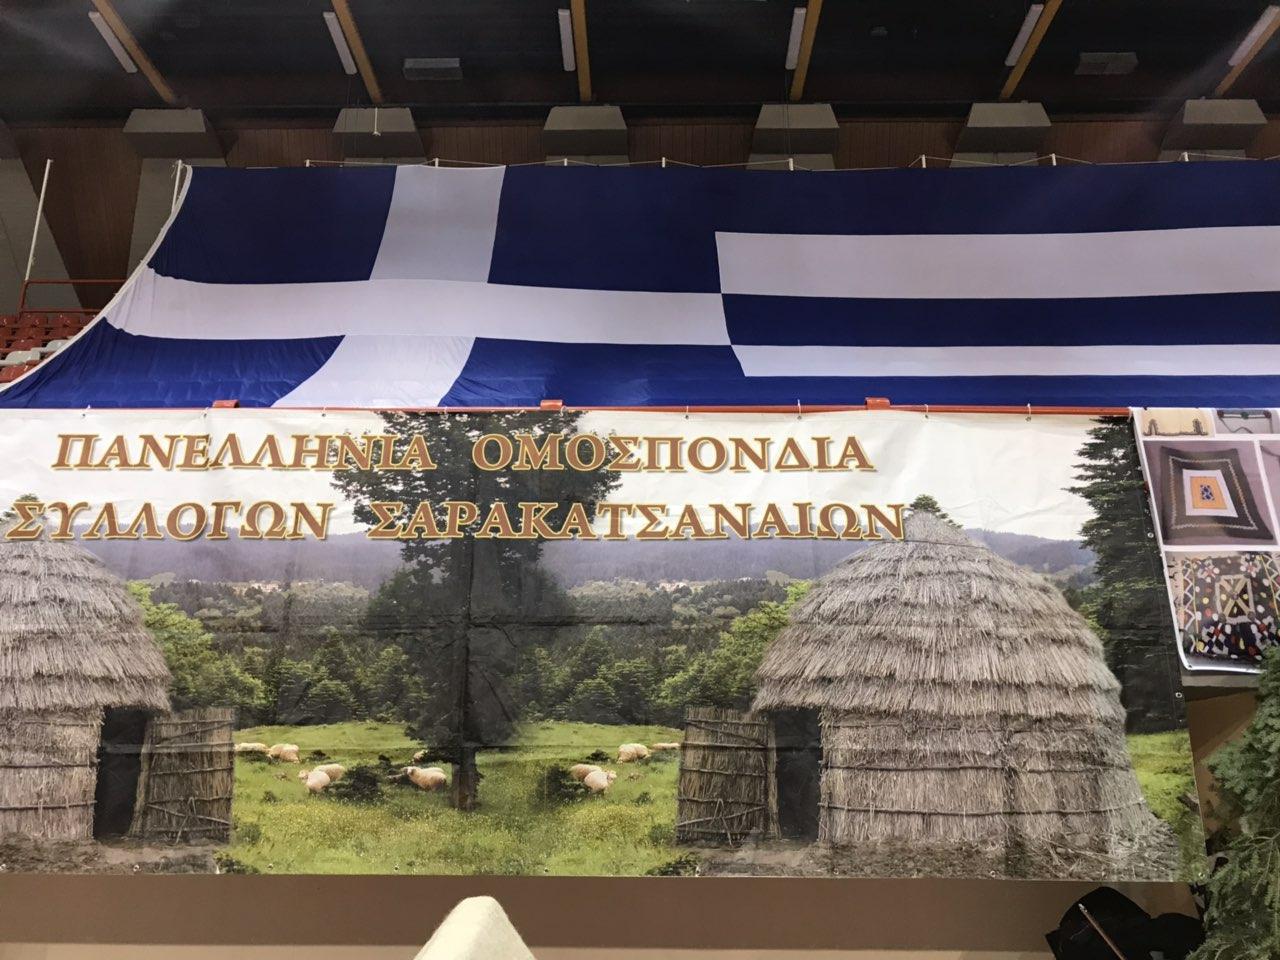 pita sarakatsanaiwn 2019 3 - O Σεβασμιώτατος στο πανελλήνιο αντάμωμα των Σαρακατσαναίων.